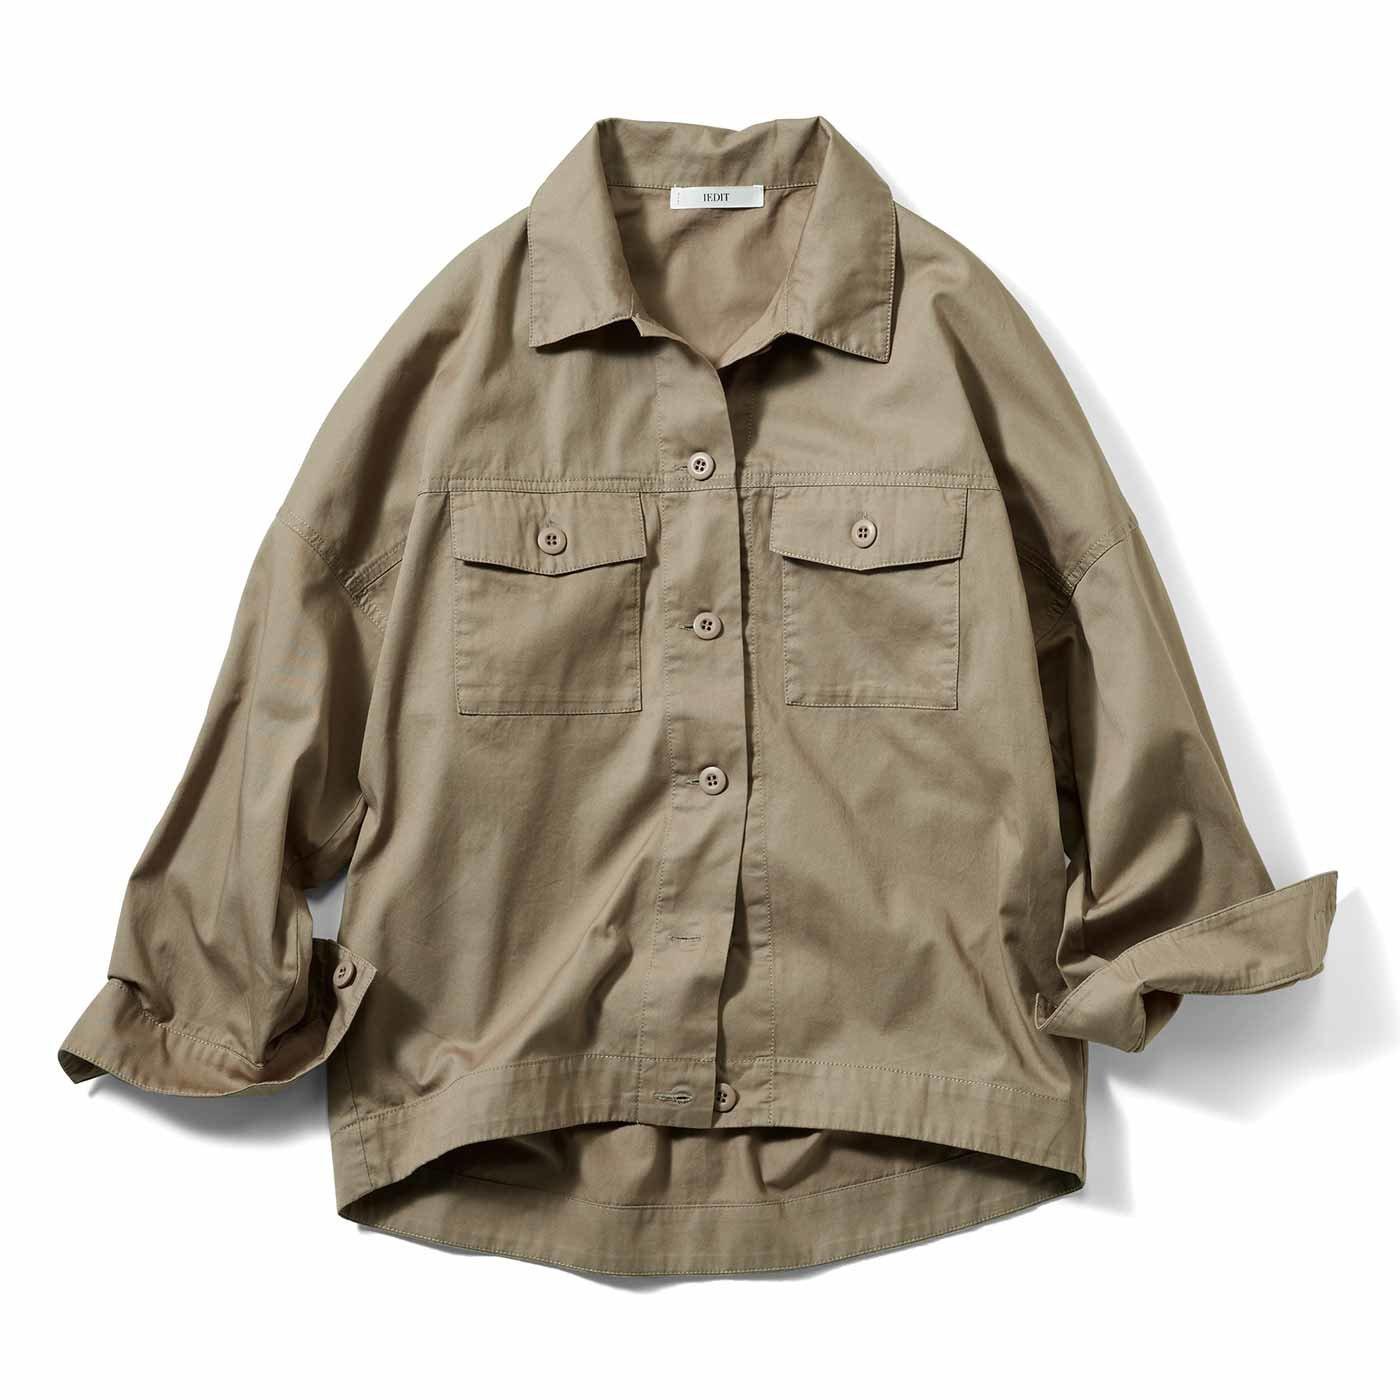 IEDIT[イディット] コットン素材のミリタリーシャツジャケット〈グレイッシュカーキ〉